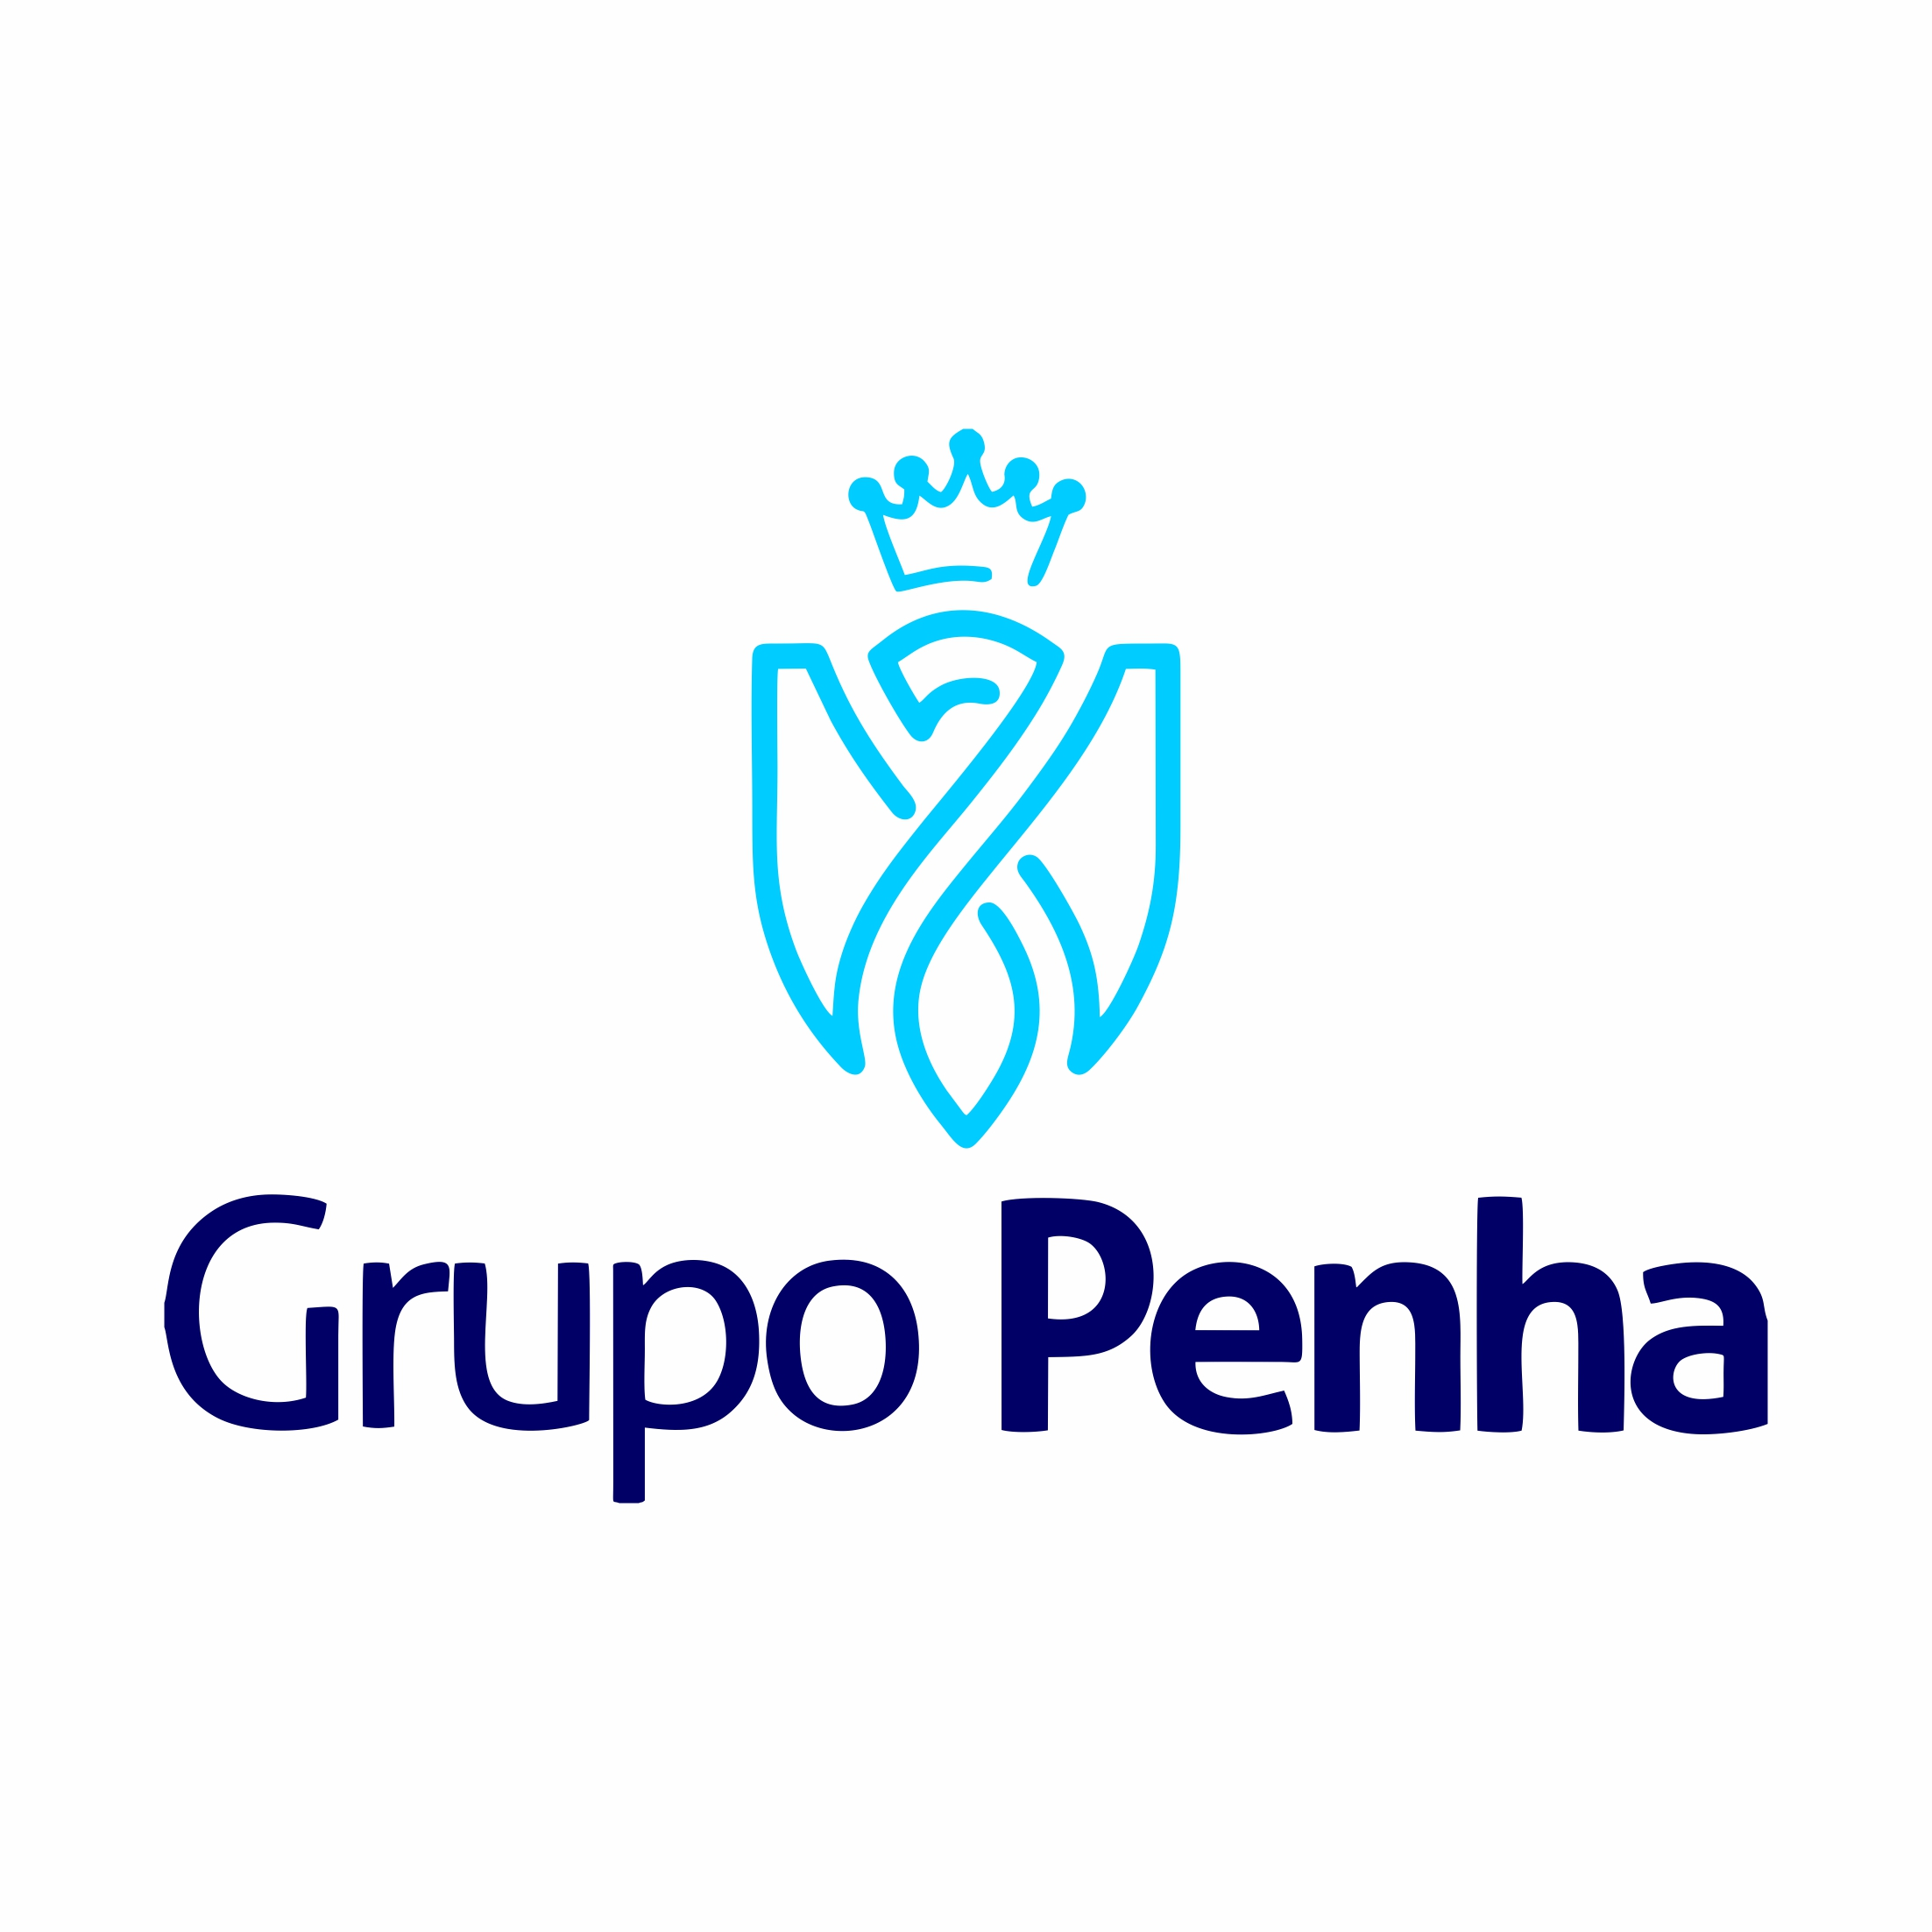 Grupo Penha